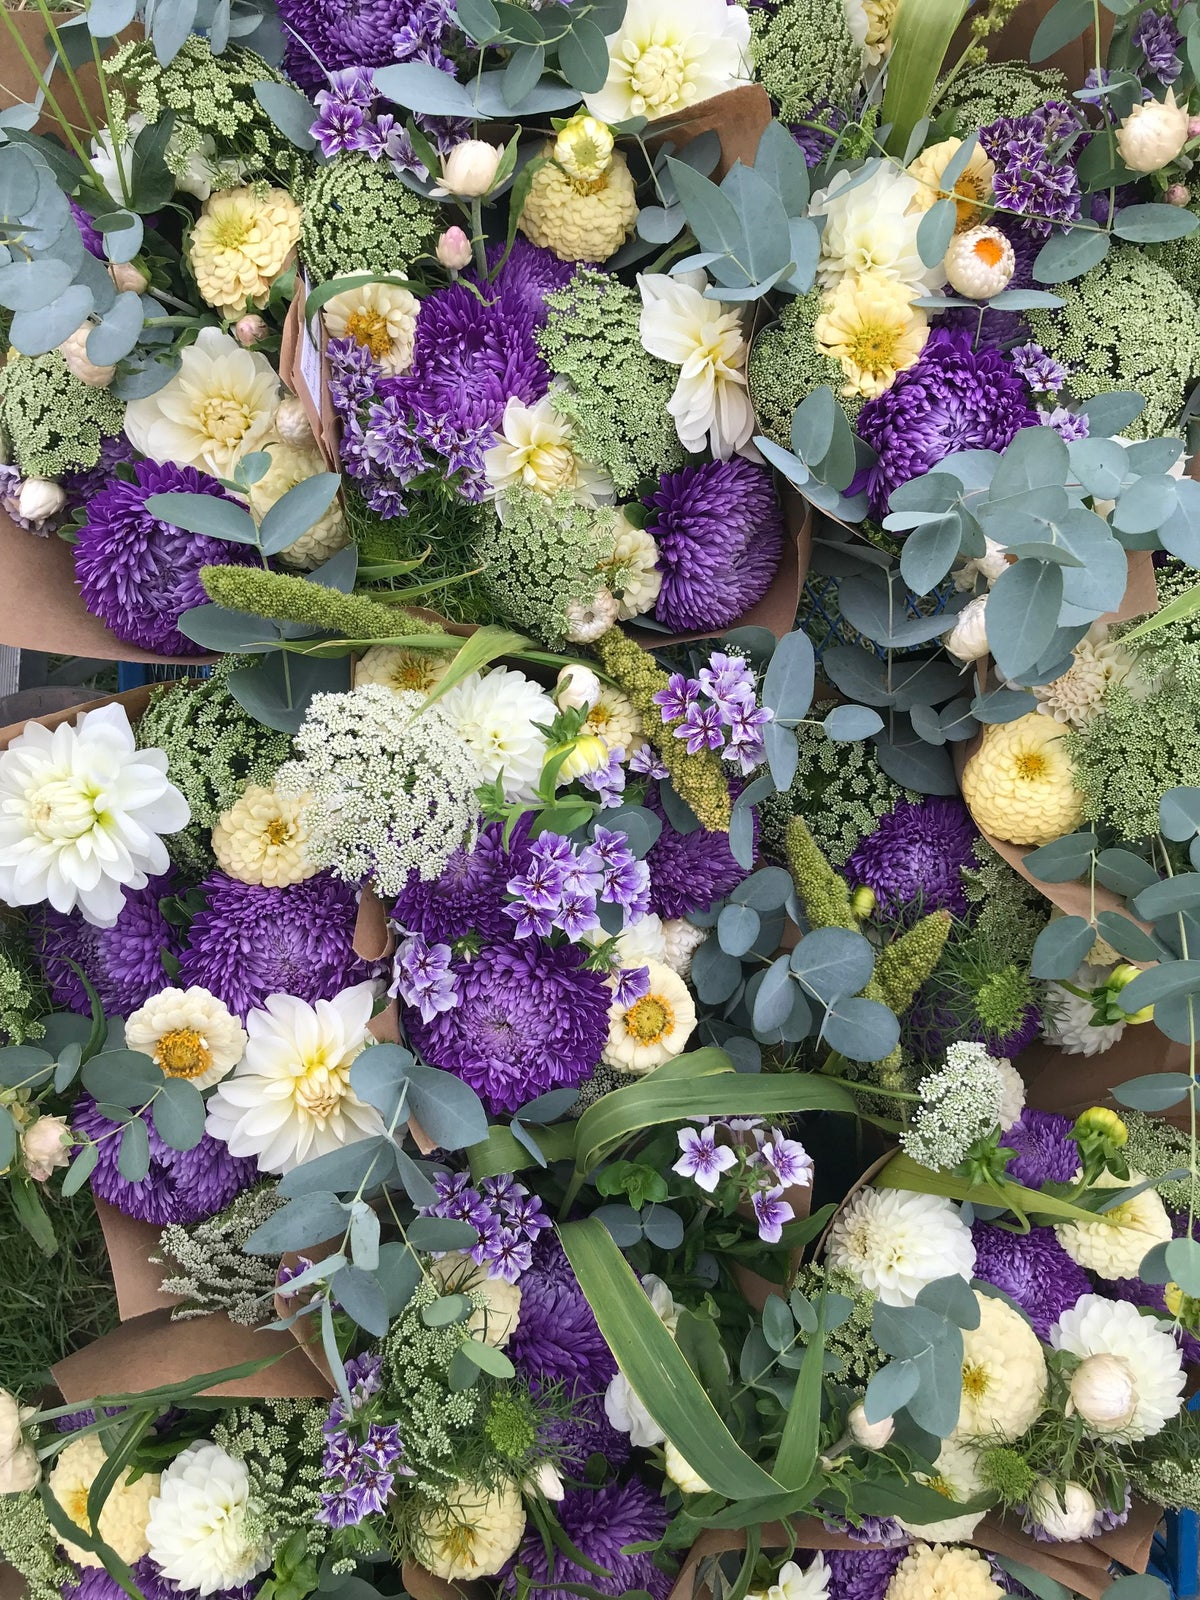 Biweekly Seasonal Mixed Bouquet CSA Share